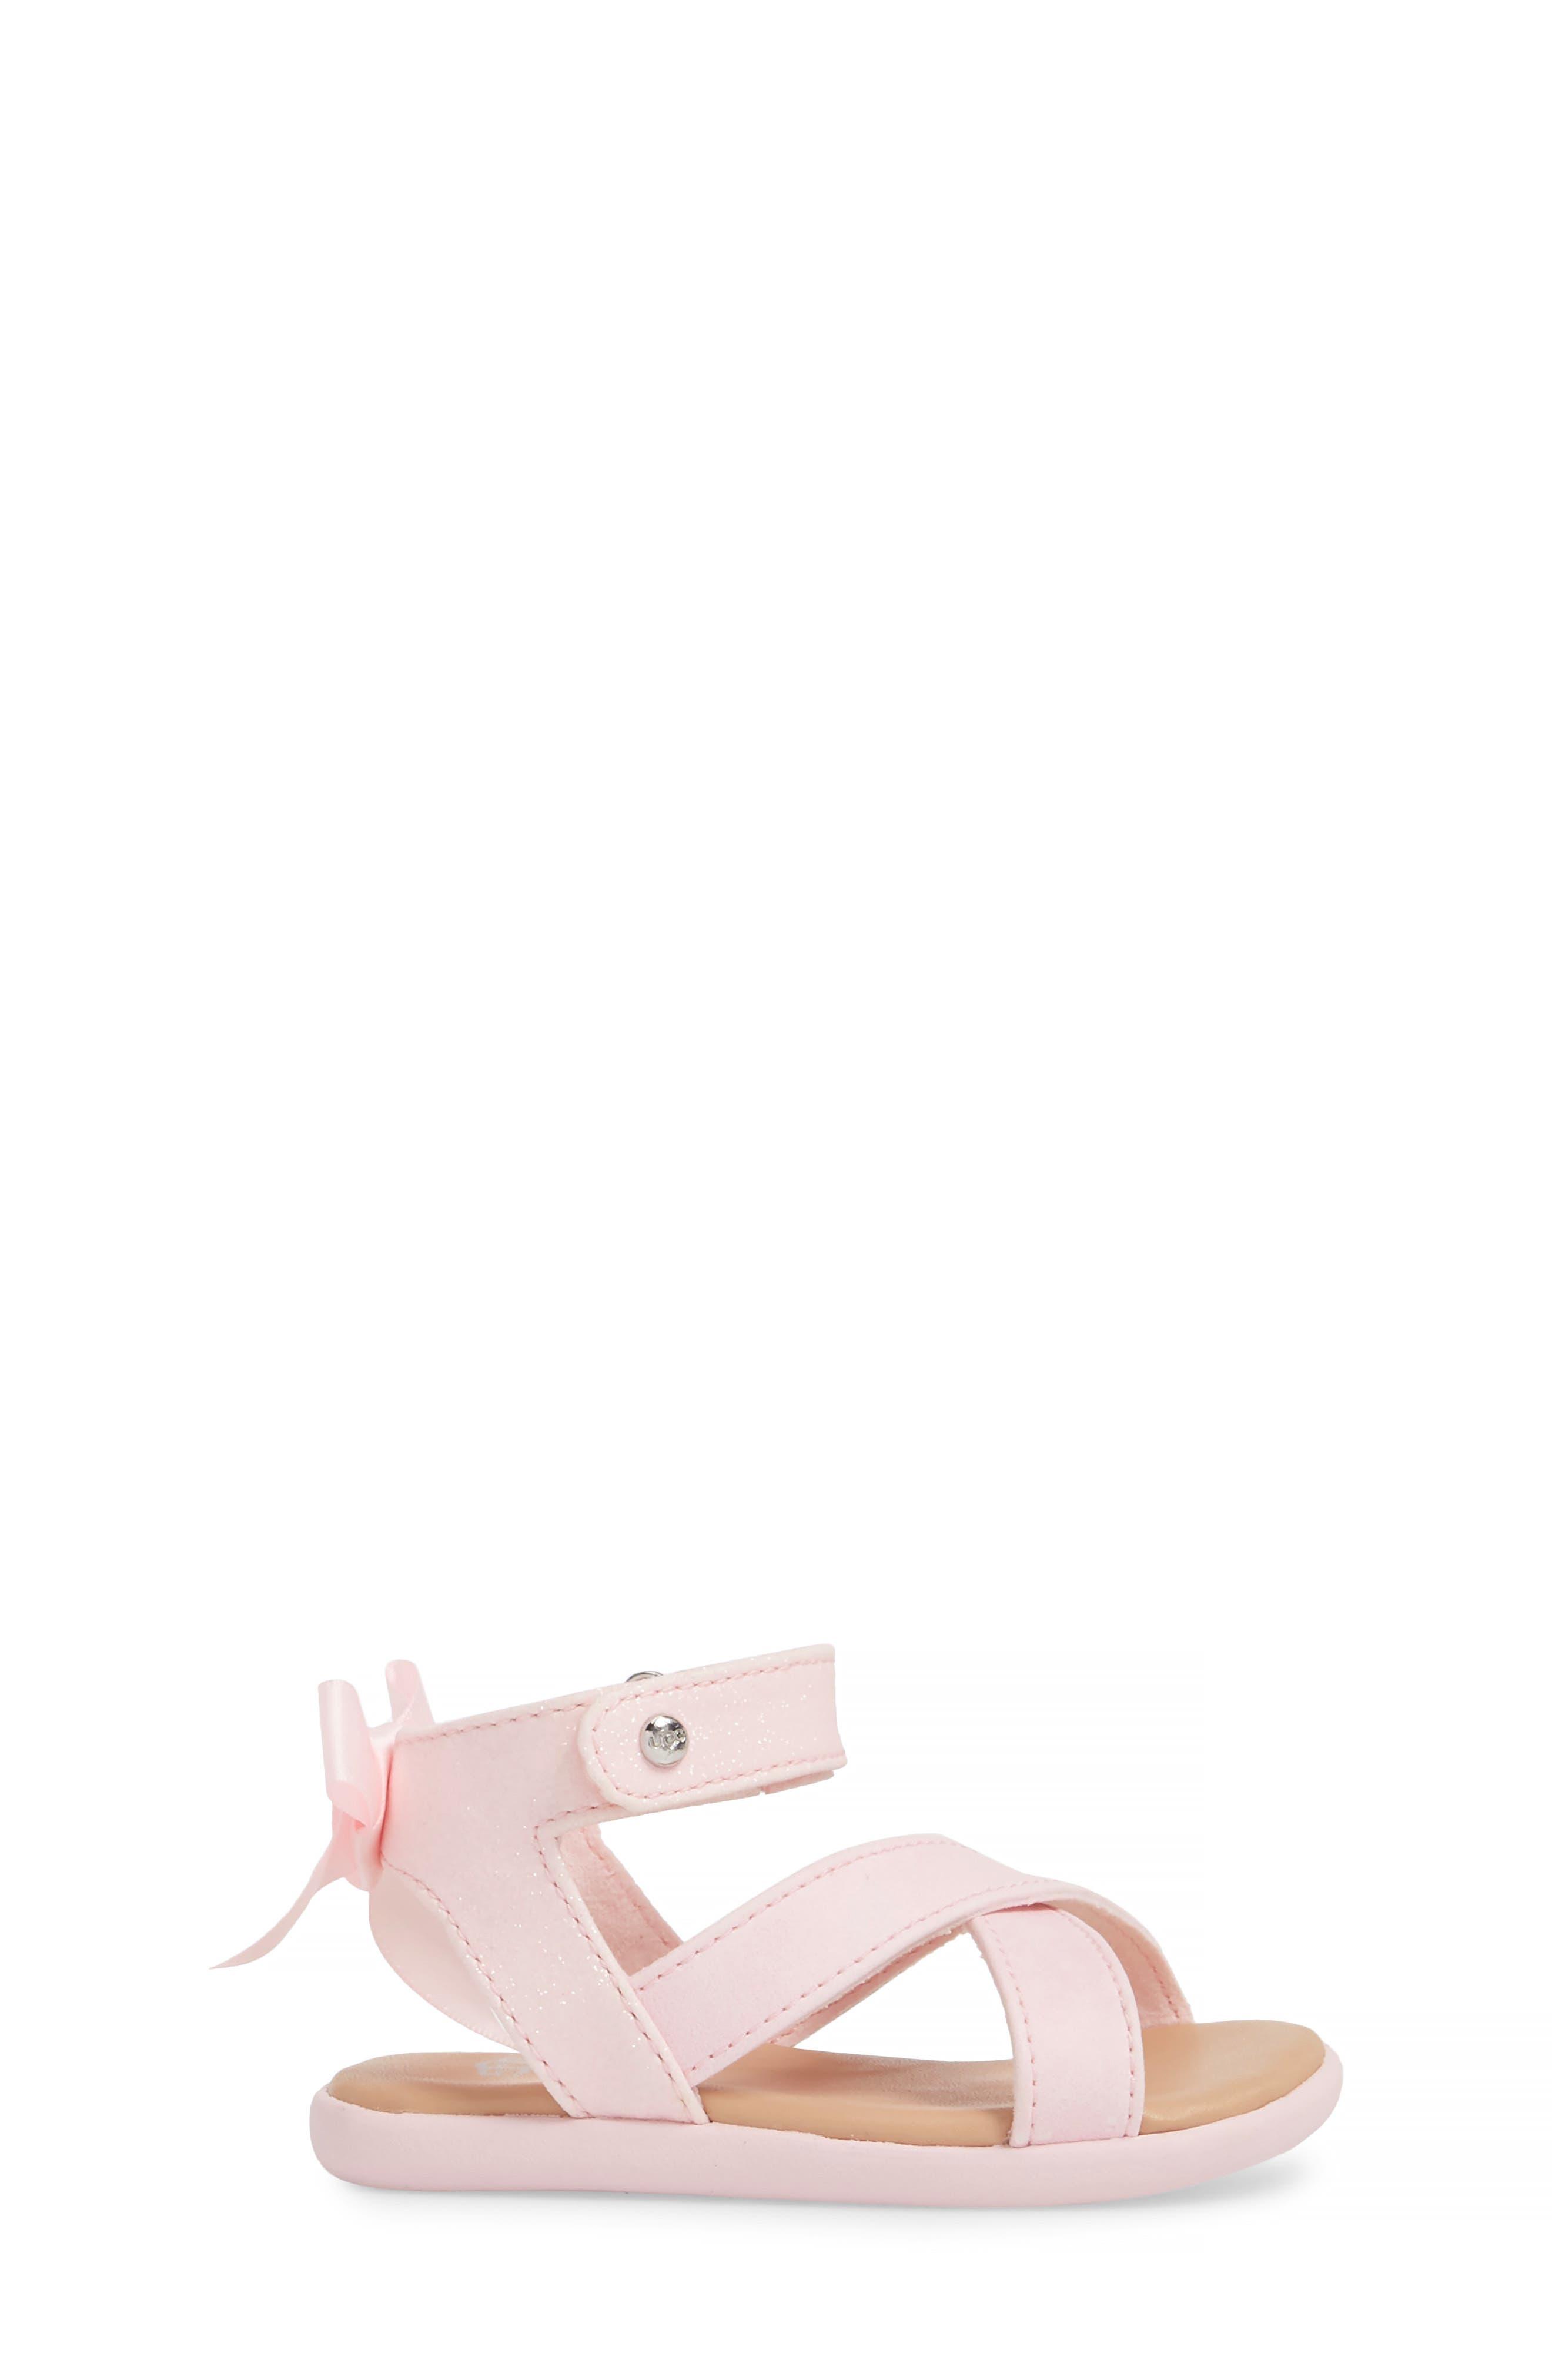 Maggiepie Sparkles Sandal,                             Alternate thumbnail 3, color,                             Seashell Pink